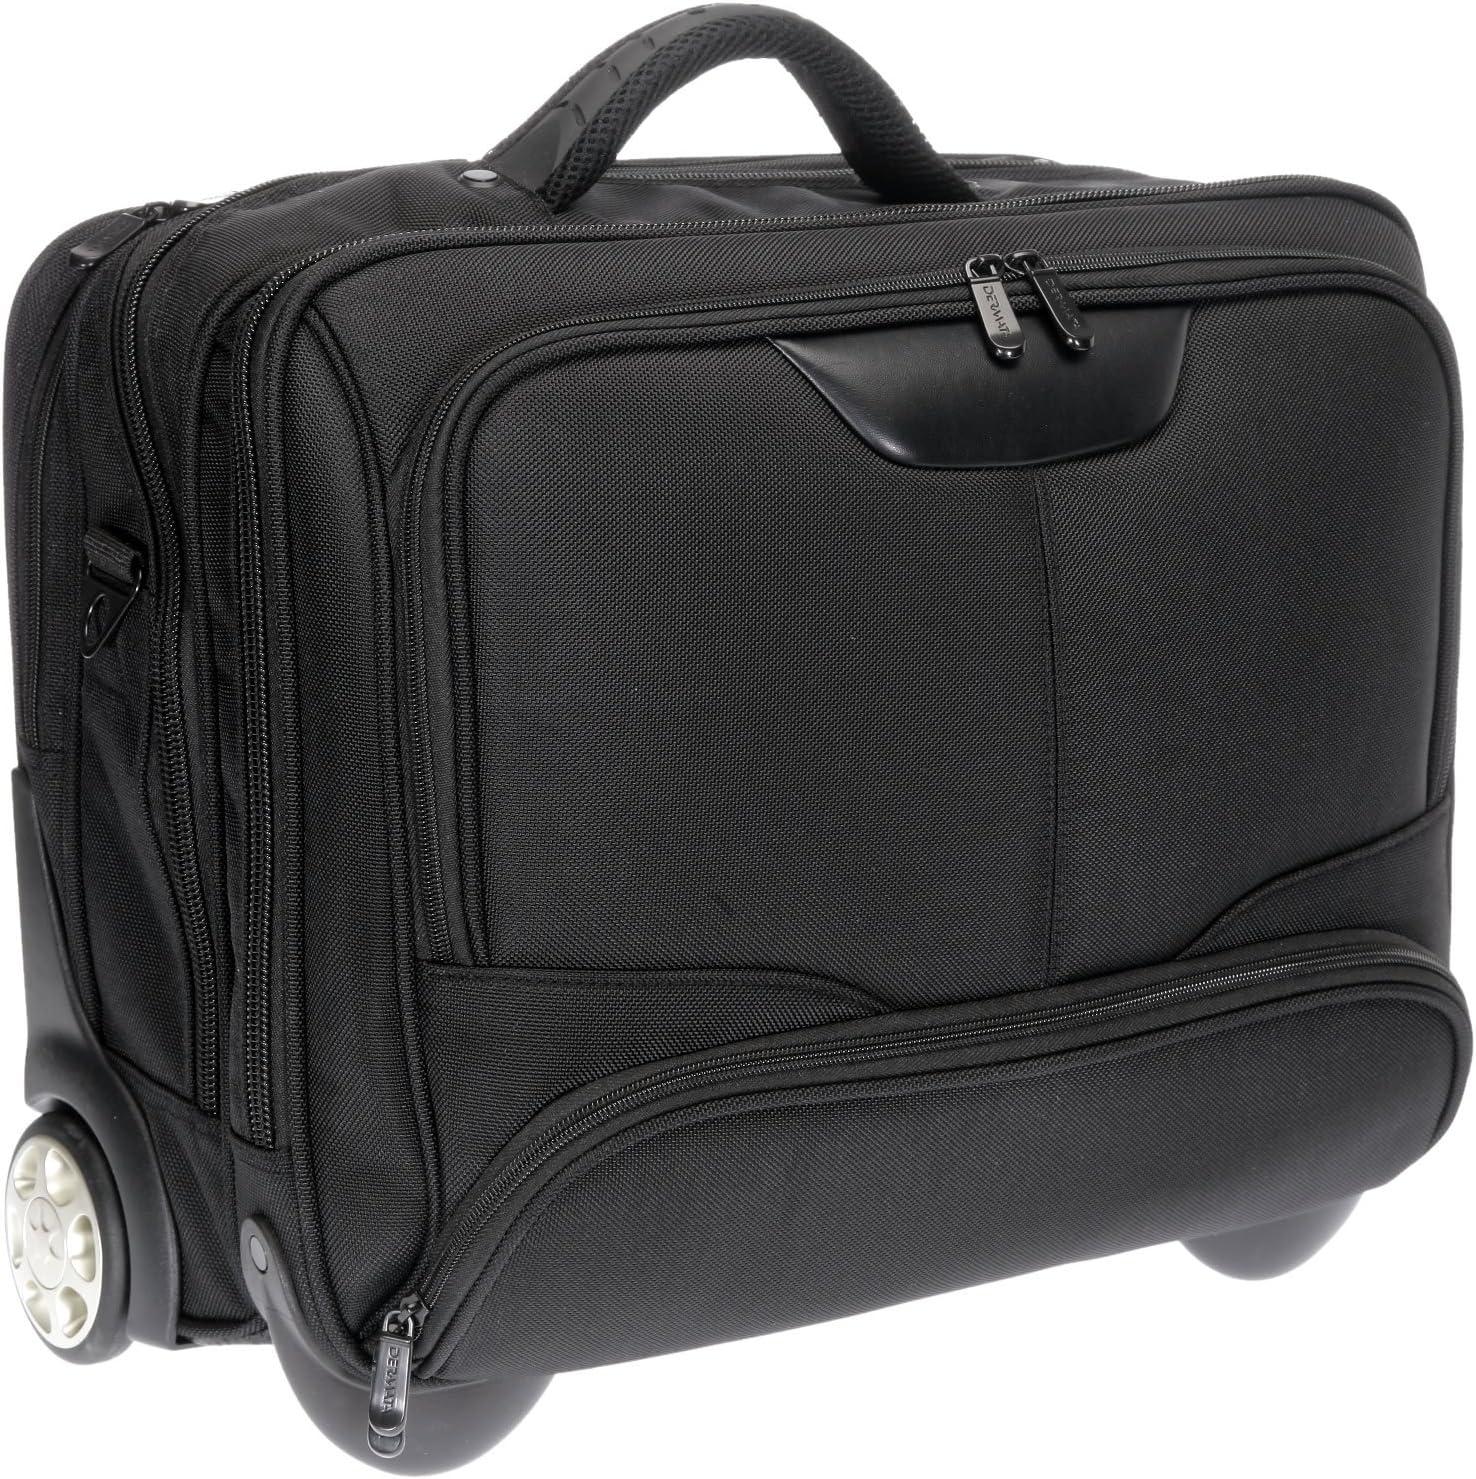 Dermata Maleta para portátil, con ruedas, con bolsillo acolchado extraíble, para portátil de 17pulgadas [41cm x 29cm] Negro L